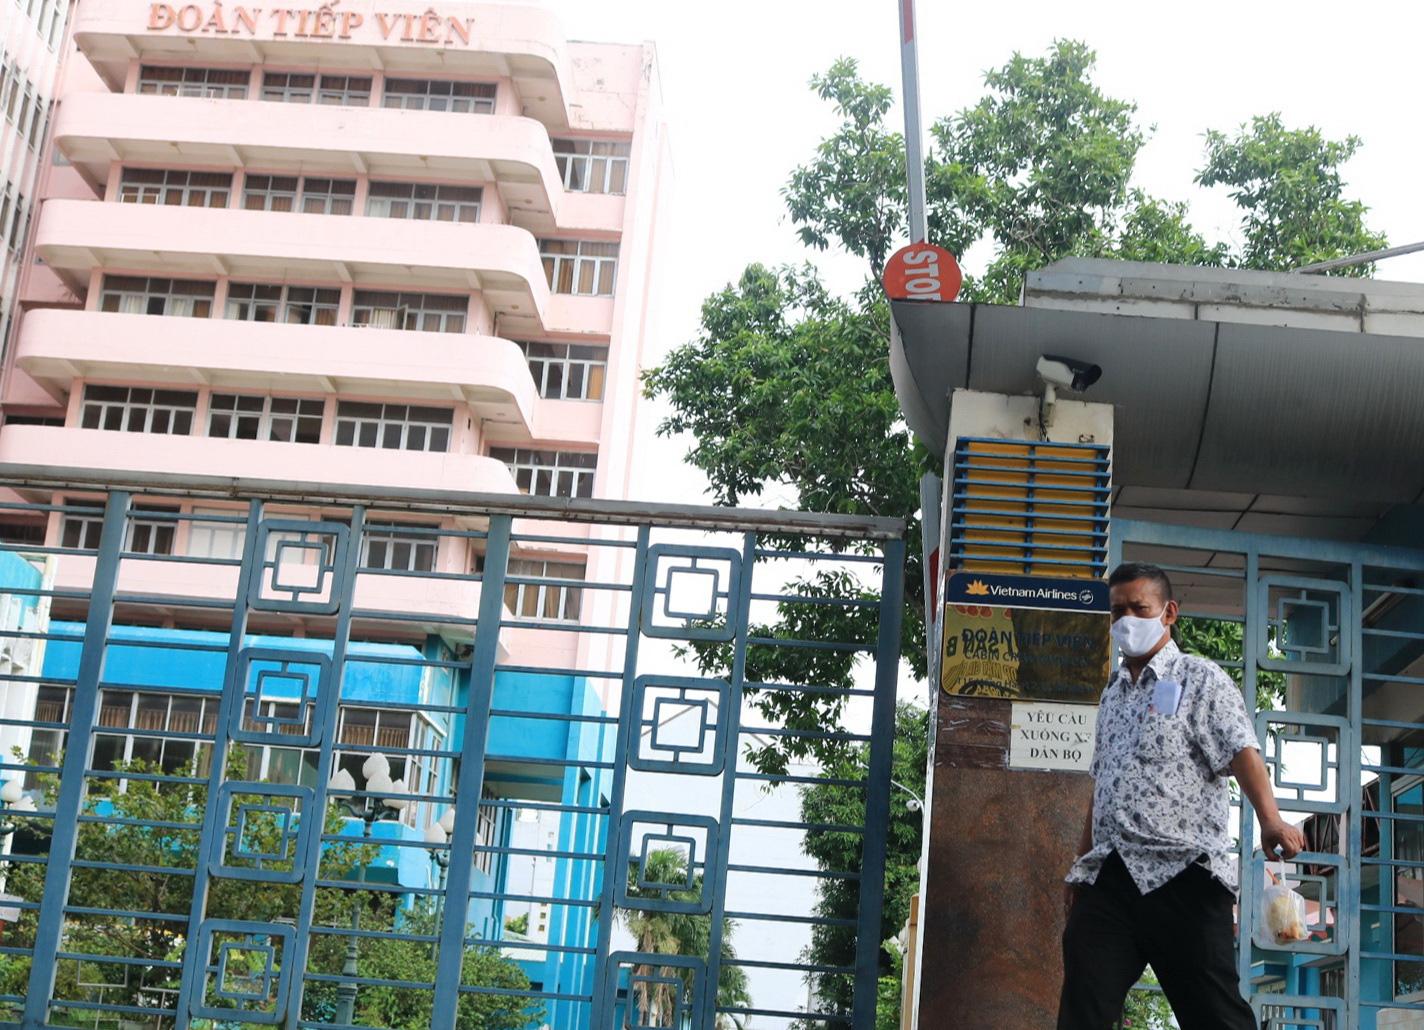 Ho Chi Minh City authorities shut down Vietnam Airlines' quarantine center